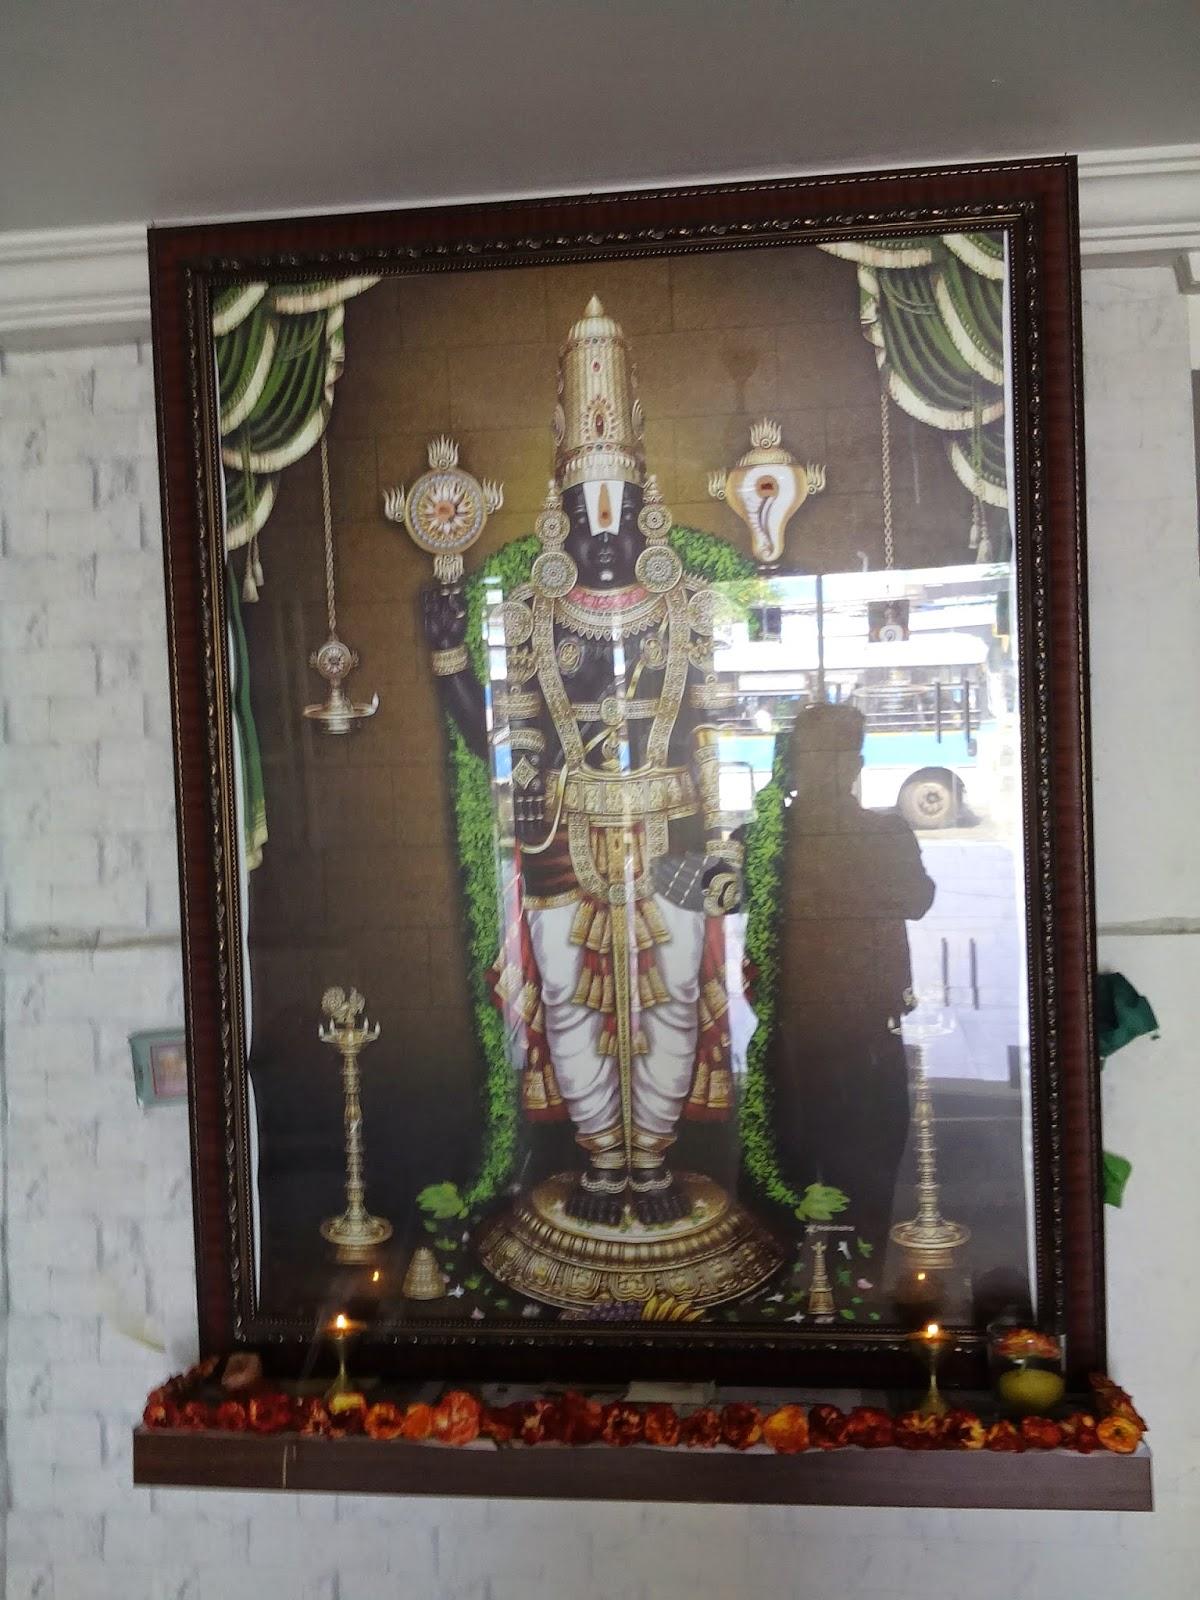 DIAMOND STUDDED FRAMES,WOODEN CRAFTS, makers in Tirupati